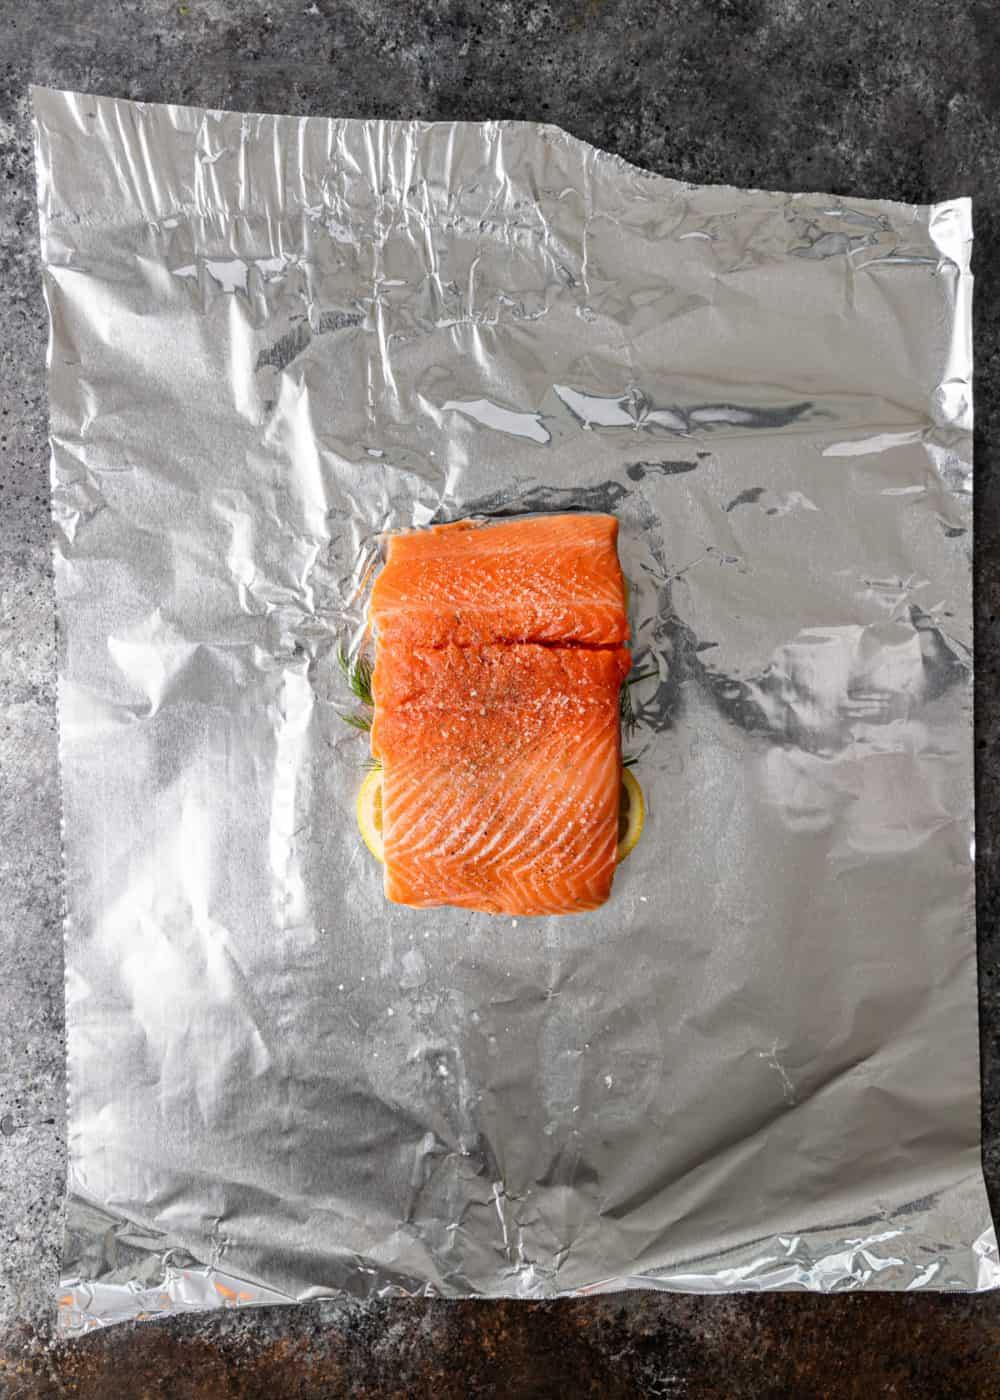 preparing wild salmon filet for grilling